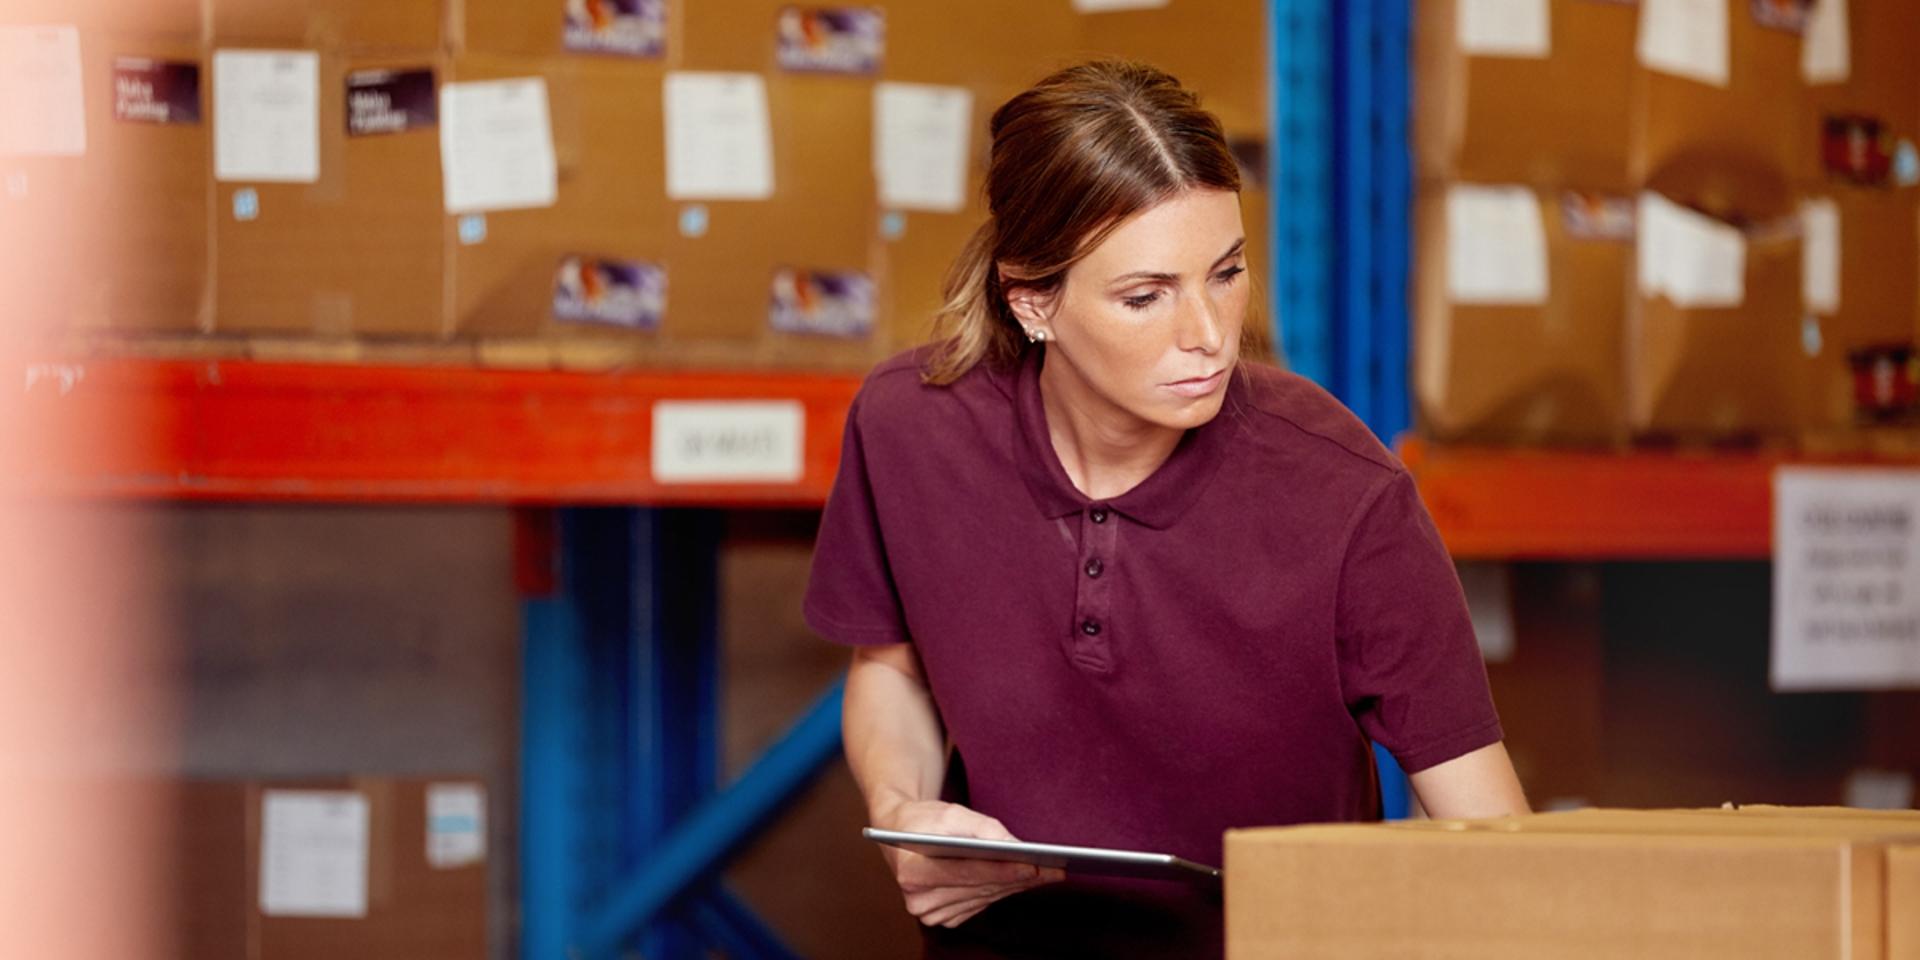 Domaine expertise Logistique - Agence placement et recrutement